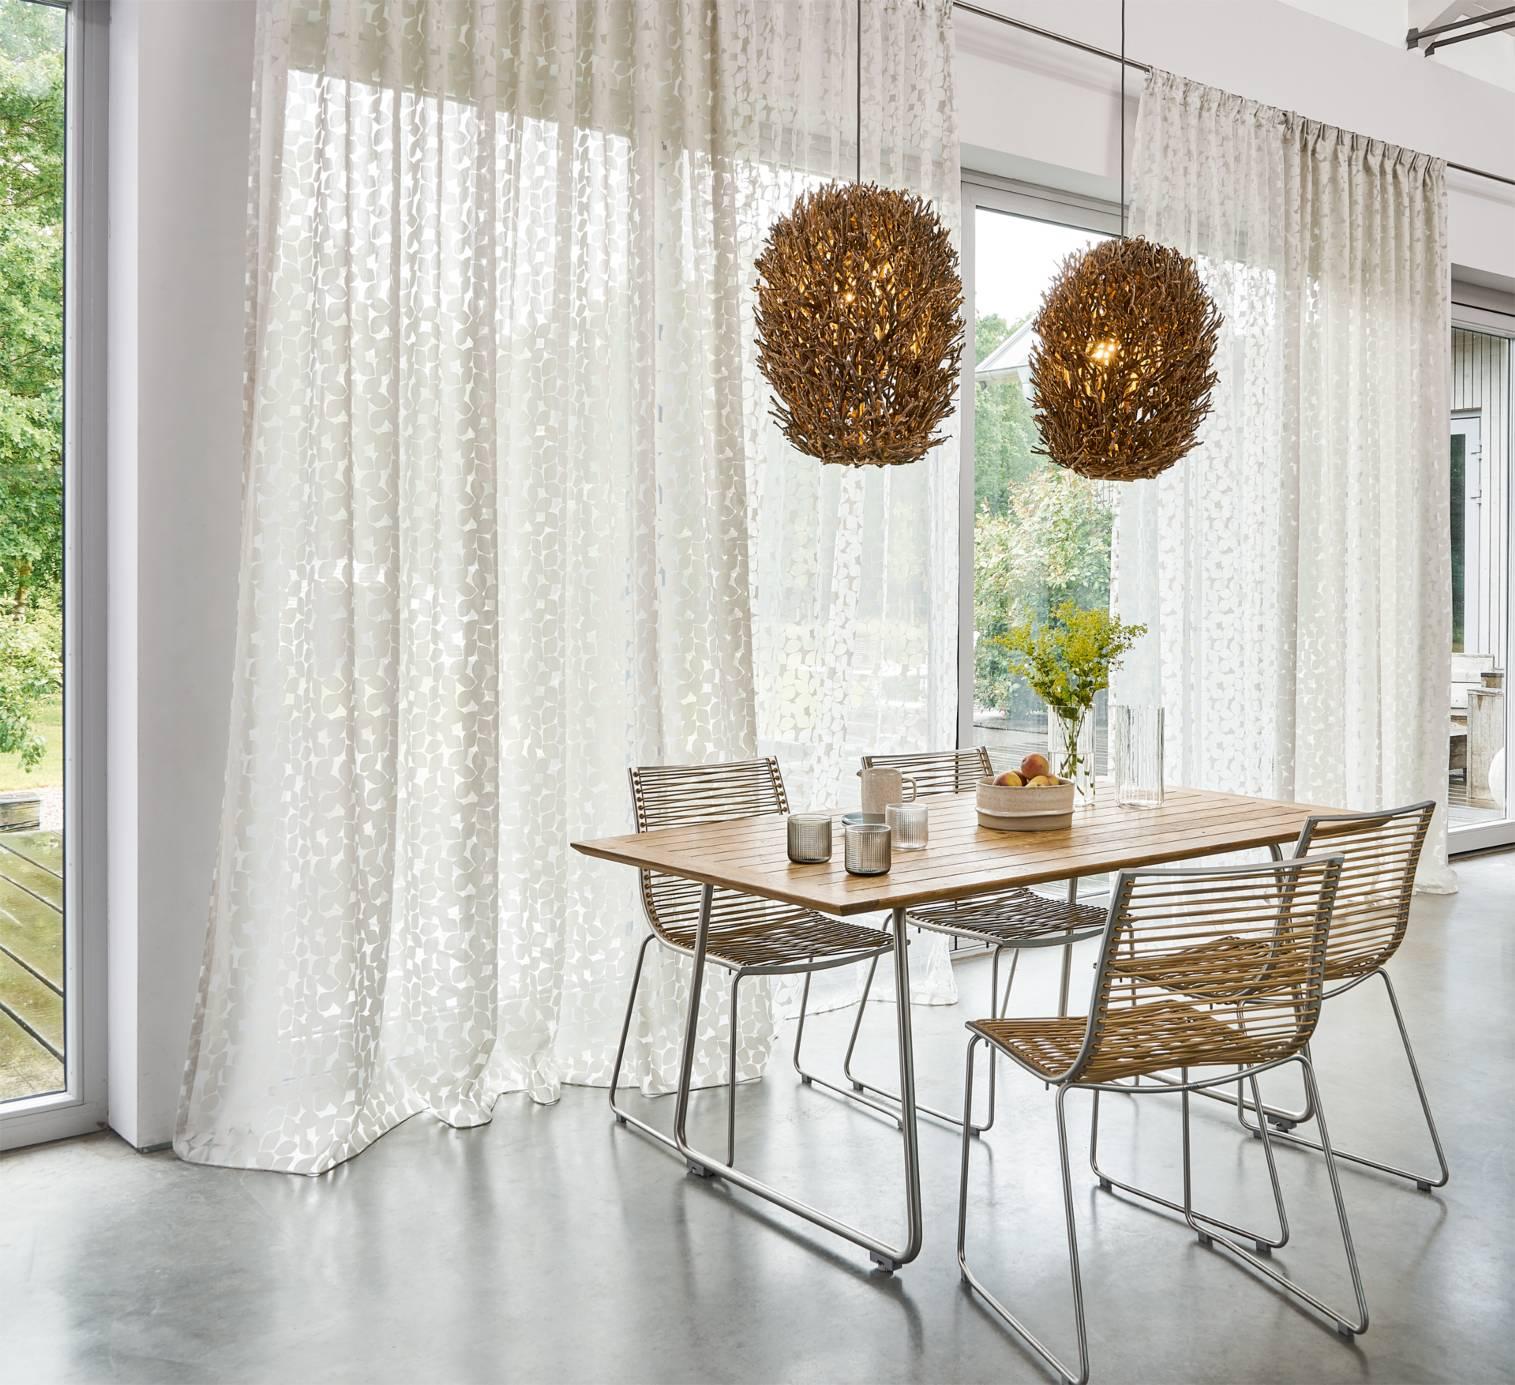 gardinen in stuttgart von metzler. Black Bedroom Furniture Sets. Home Design Ideas